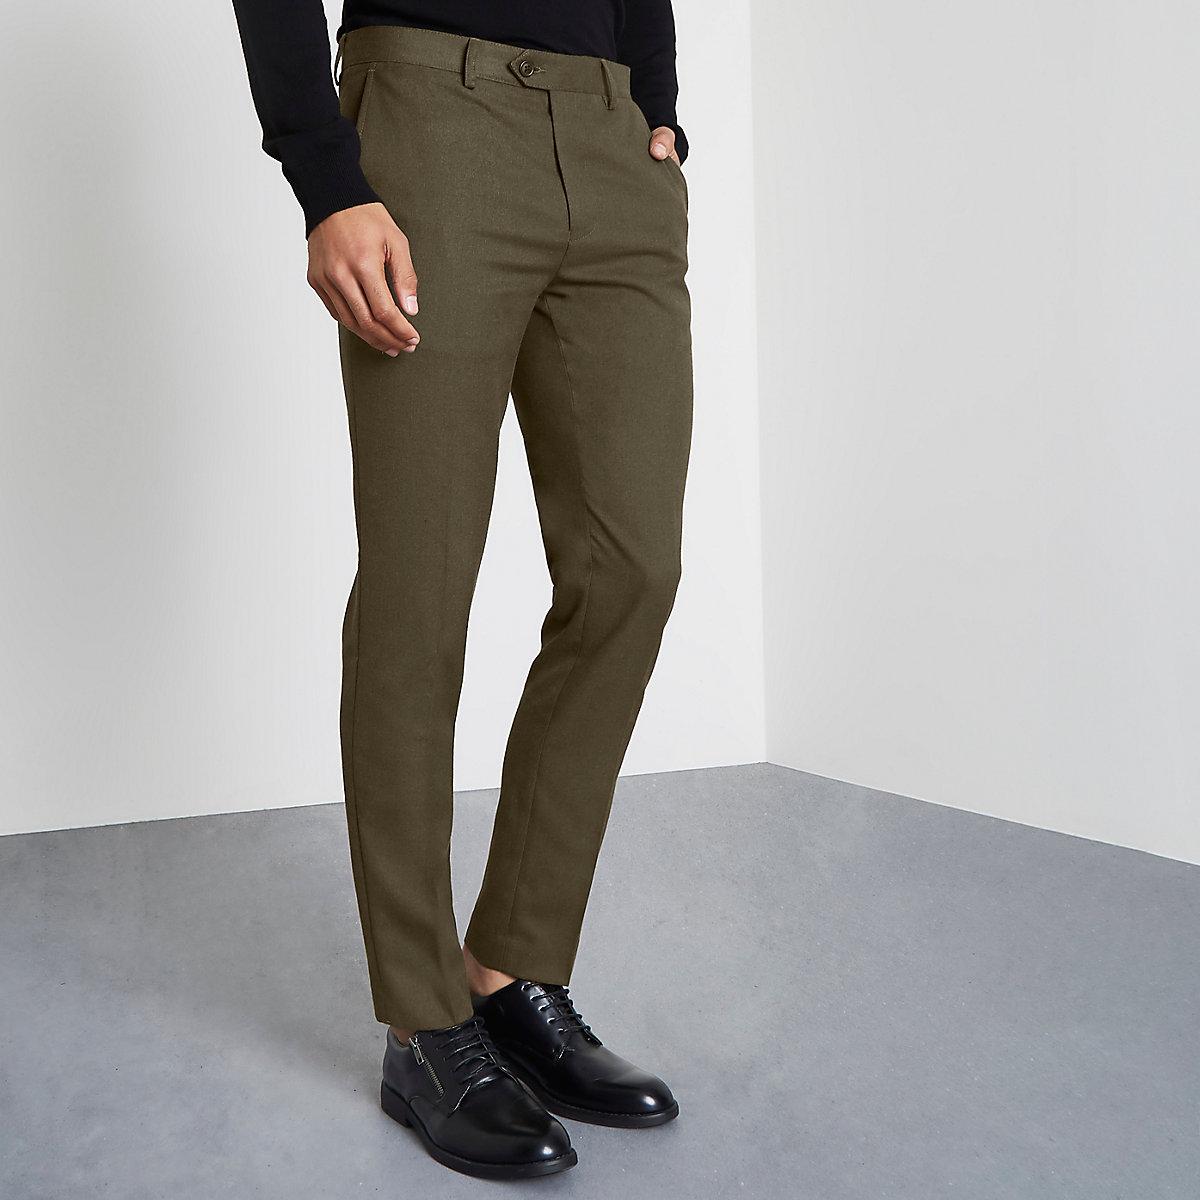 Khaki green smart skinny fit pants